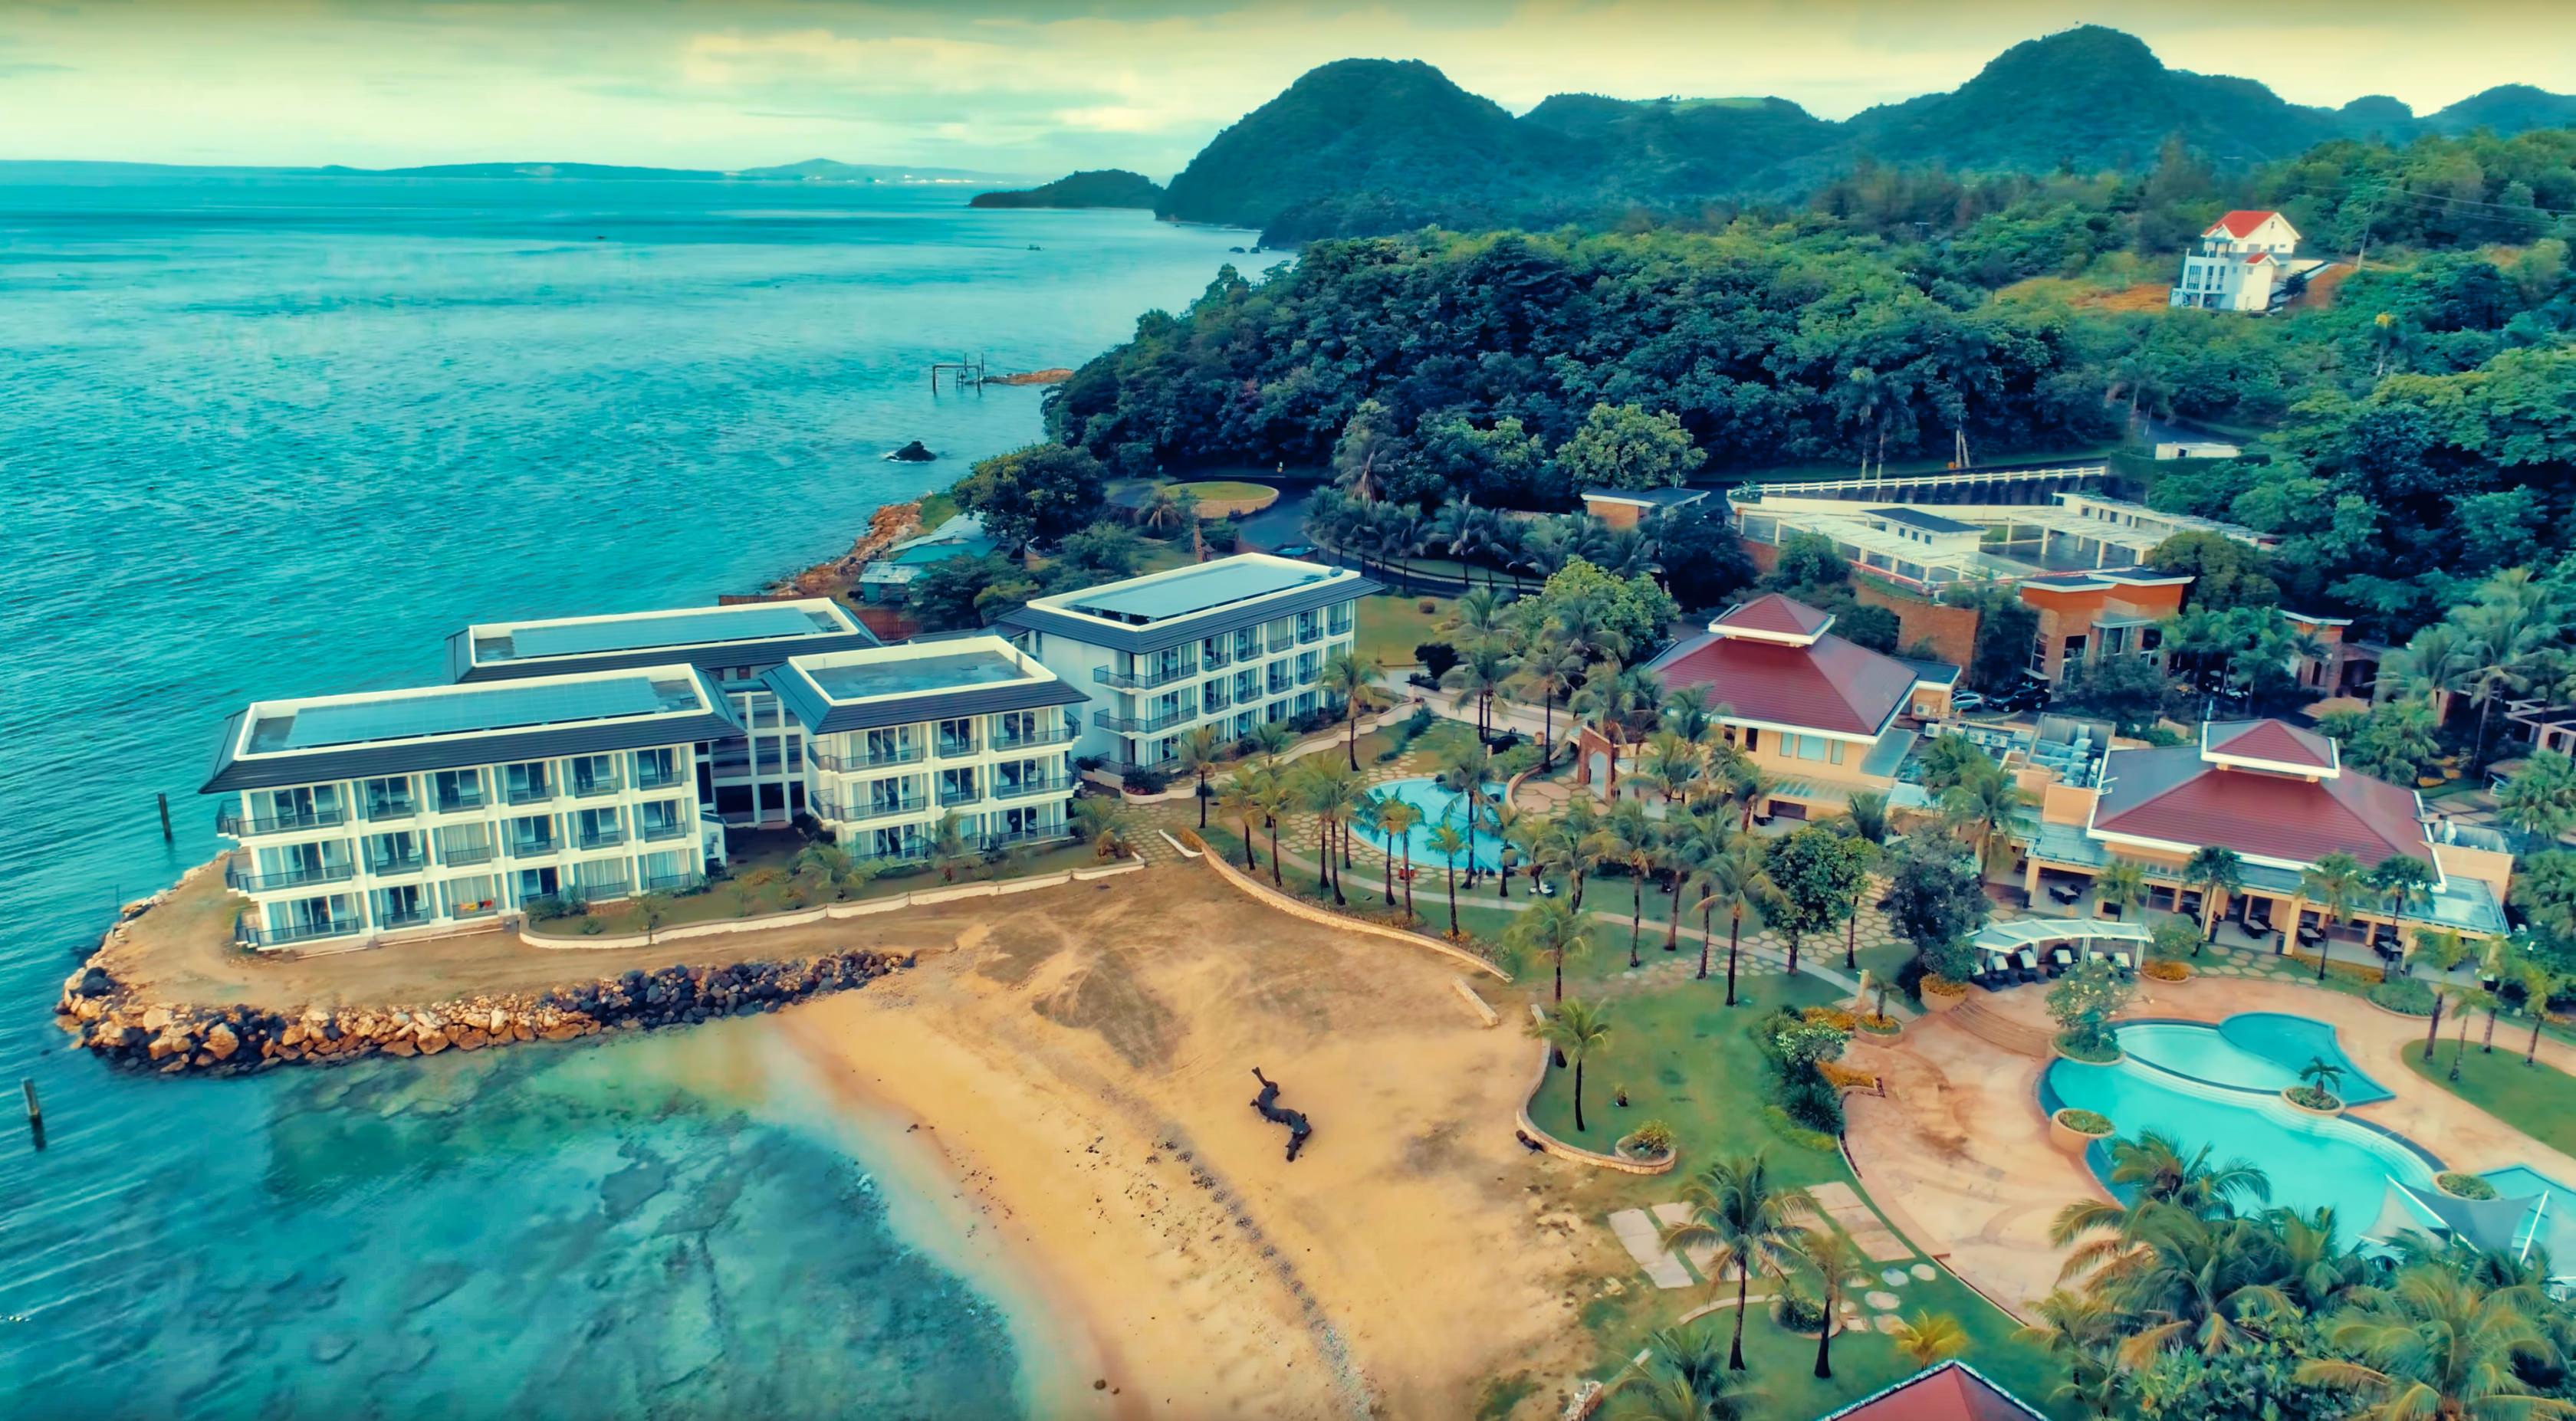 Tropical Island Getaways: VIDEO: Misibis Bay Tropical Island Getaway Aerial Tour